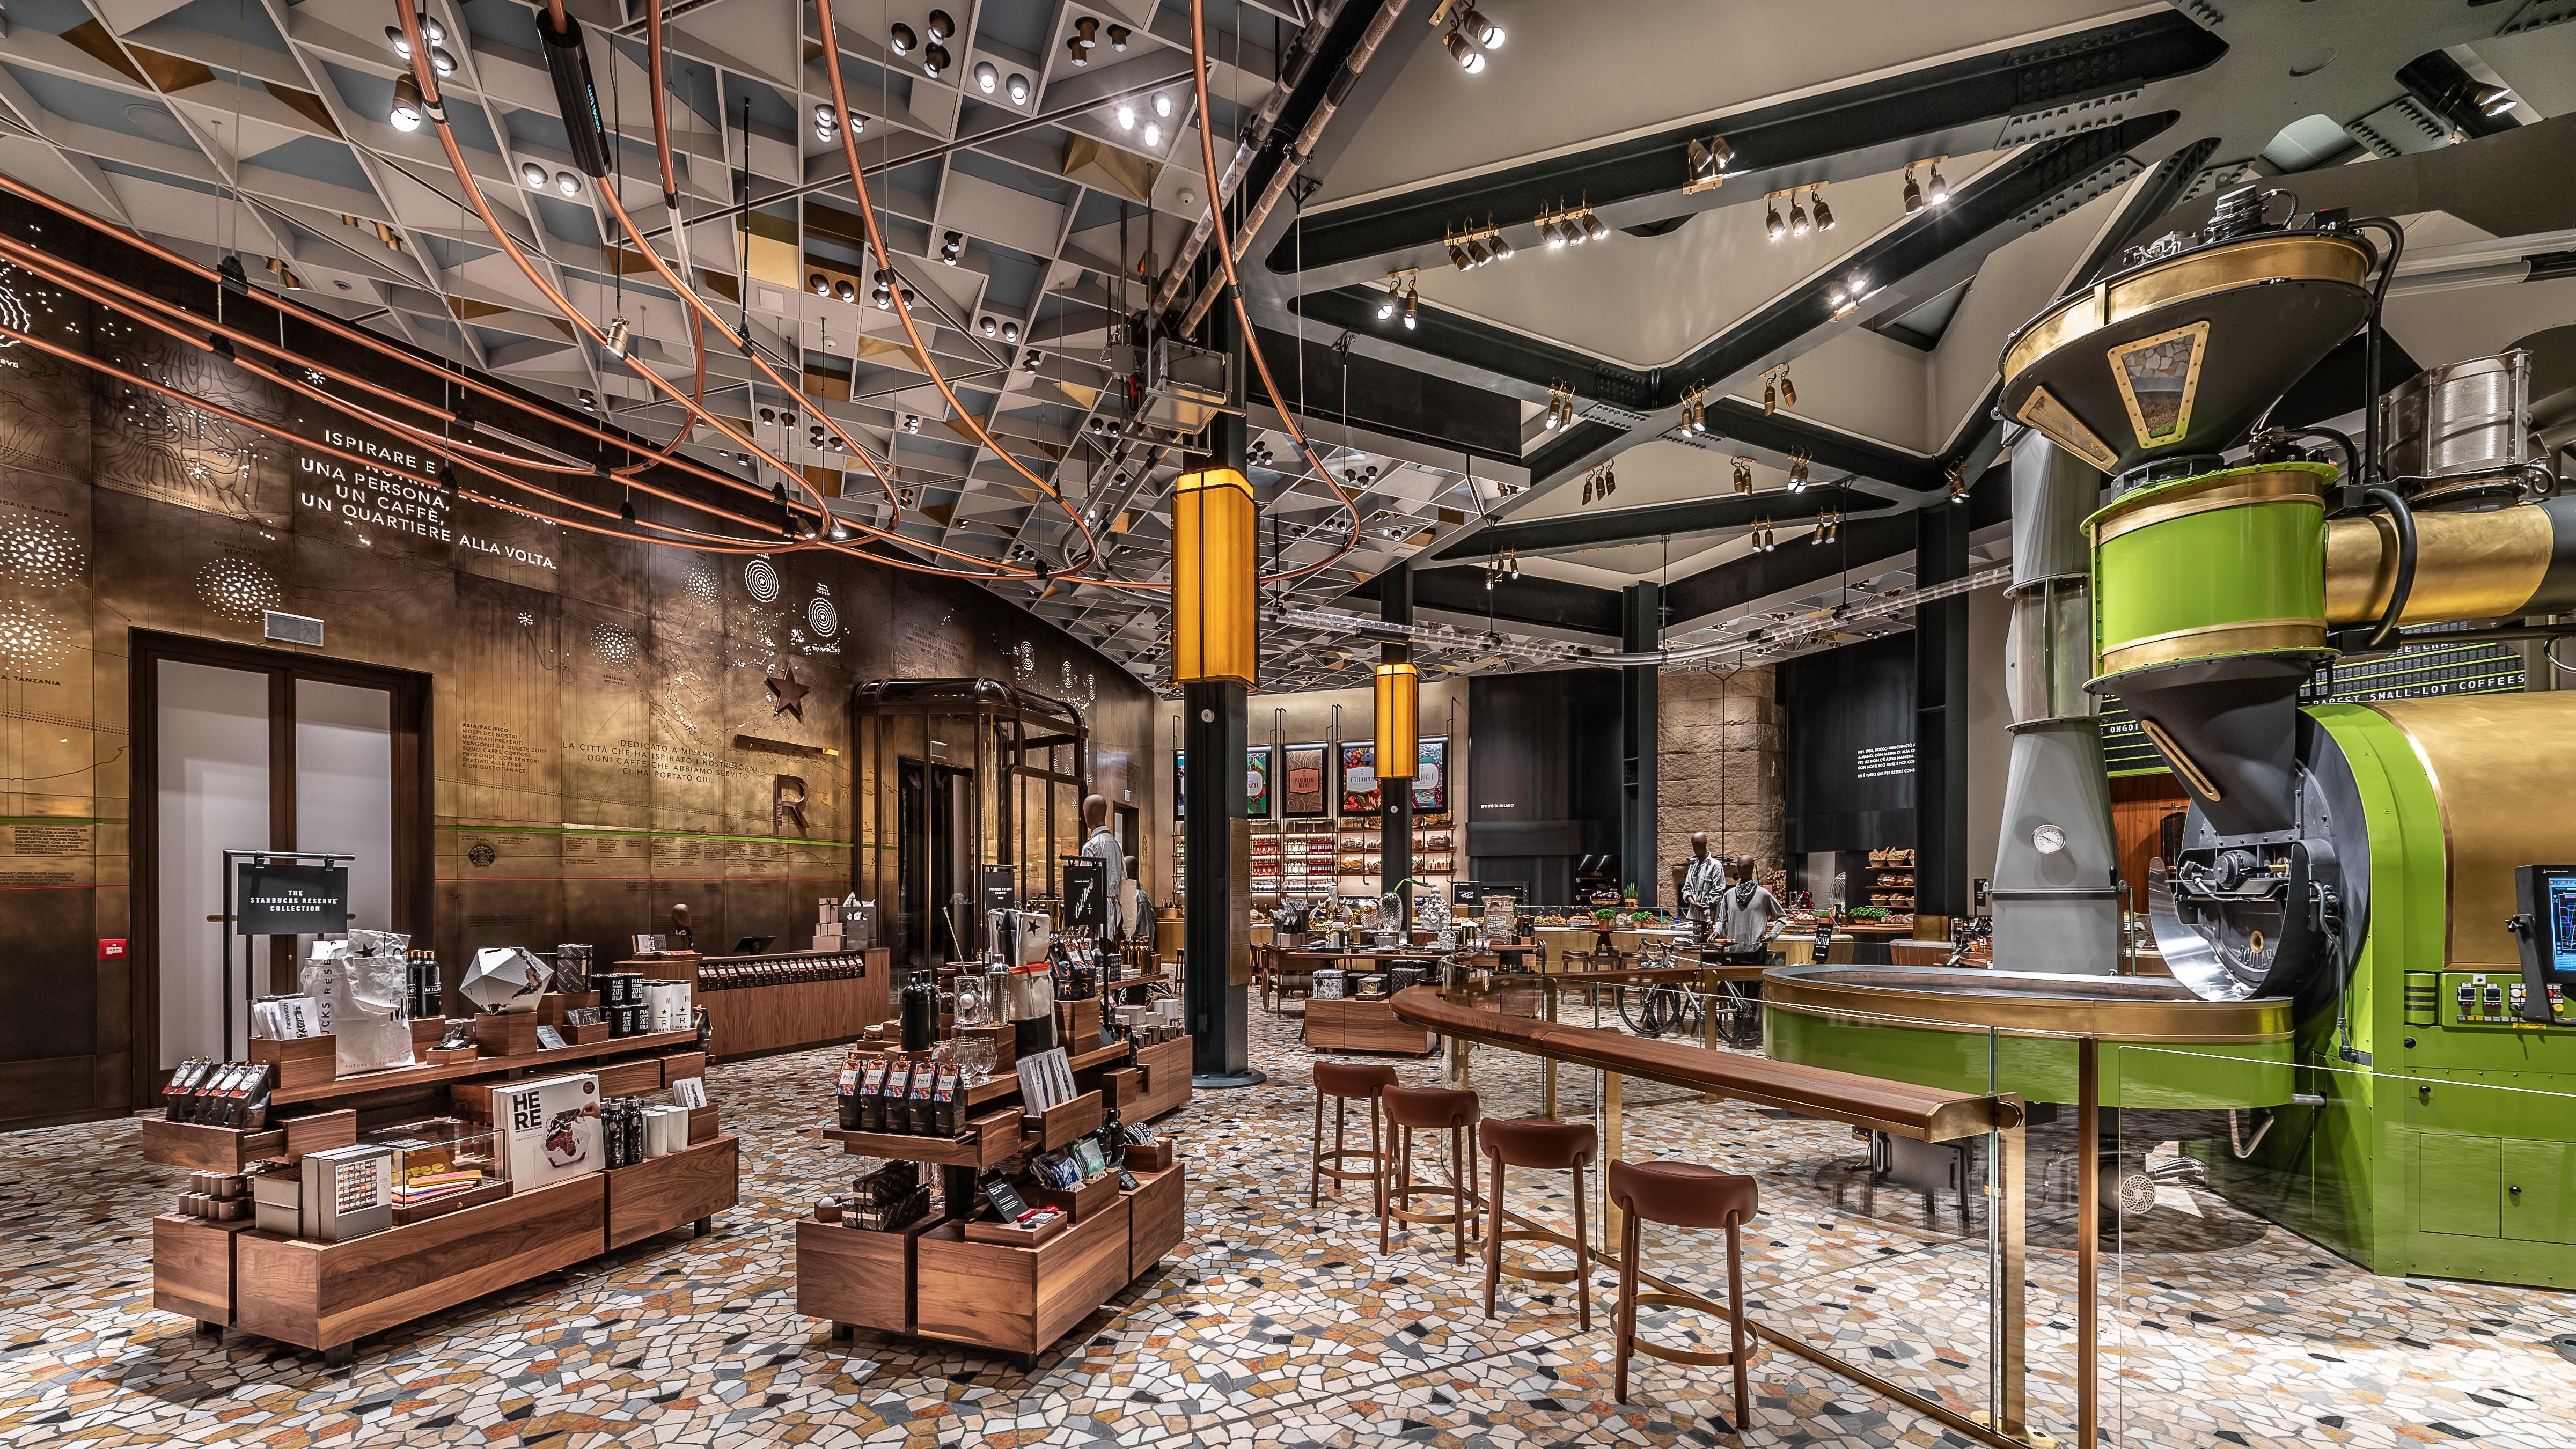 starbucks new cafe in milan